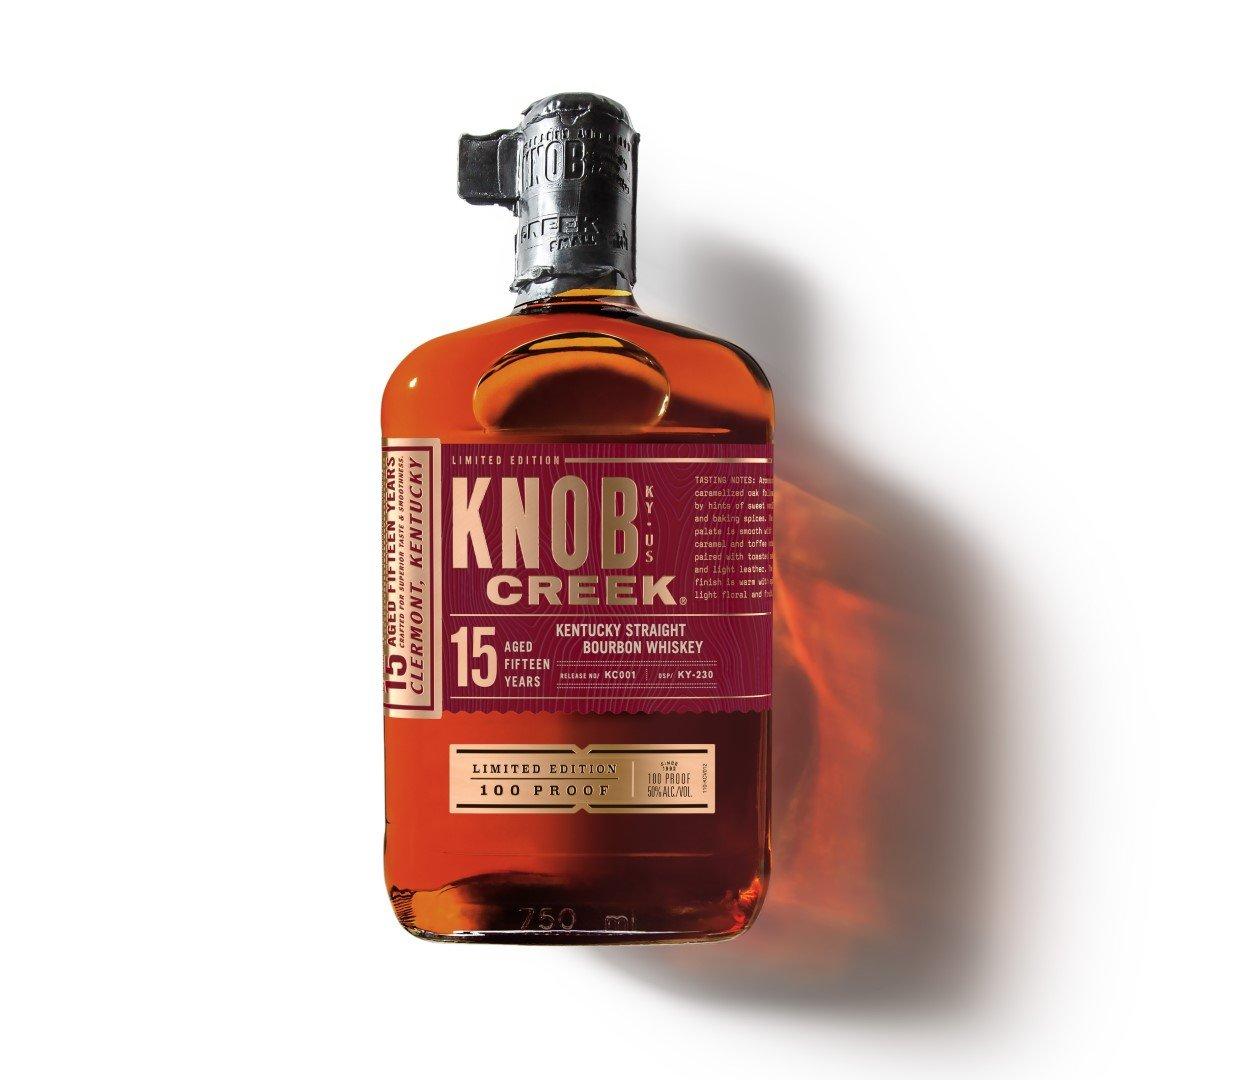 Knob Creek Bourbon 15 Years Old